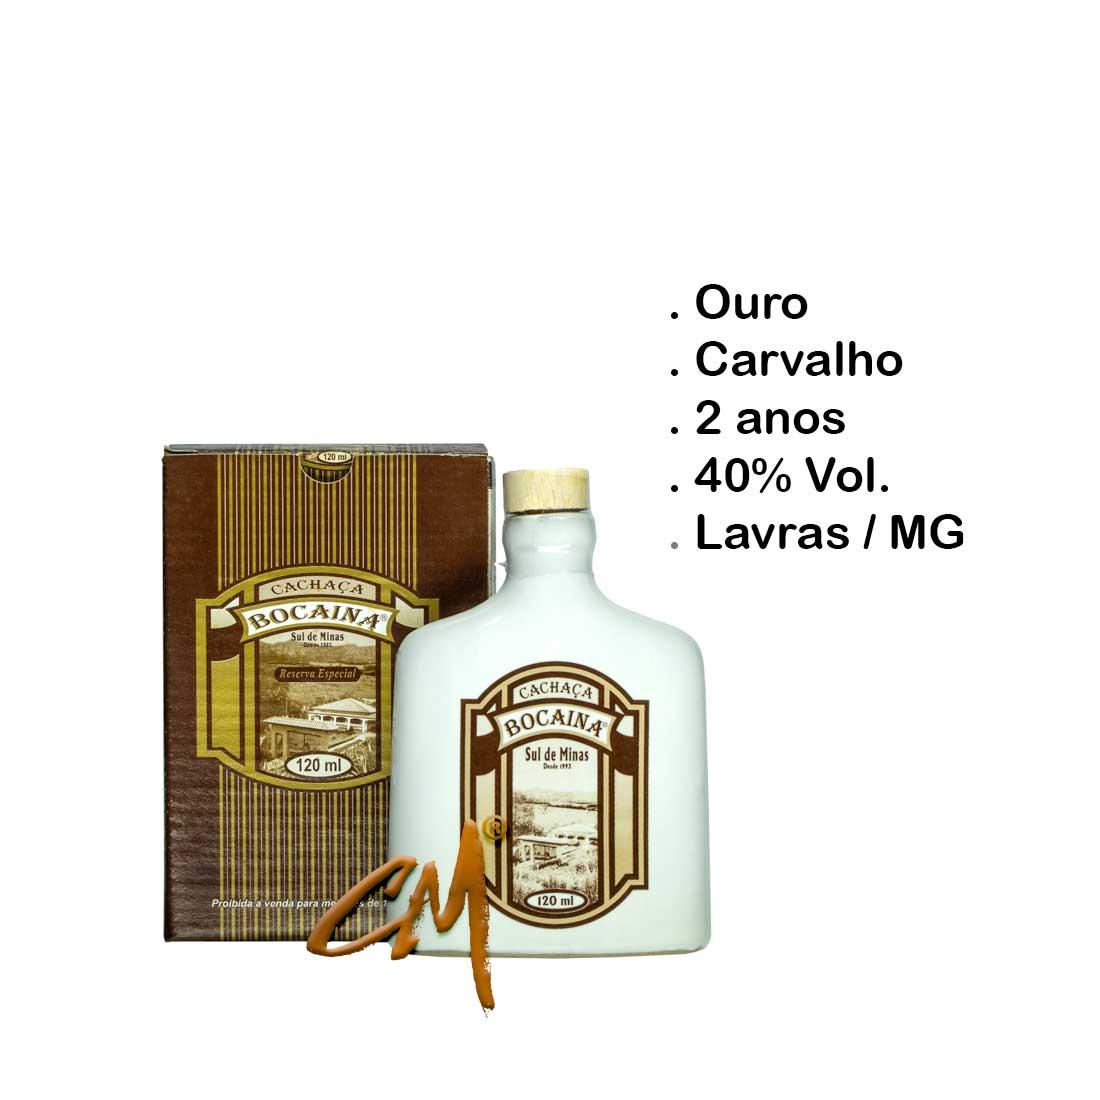 Cachaça Bocaina Carvalho Louça 120 ml (Lavras - MG)